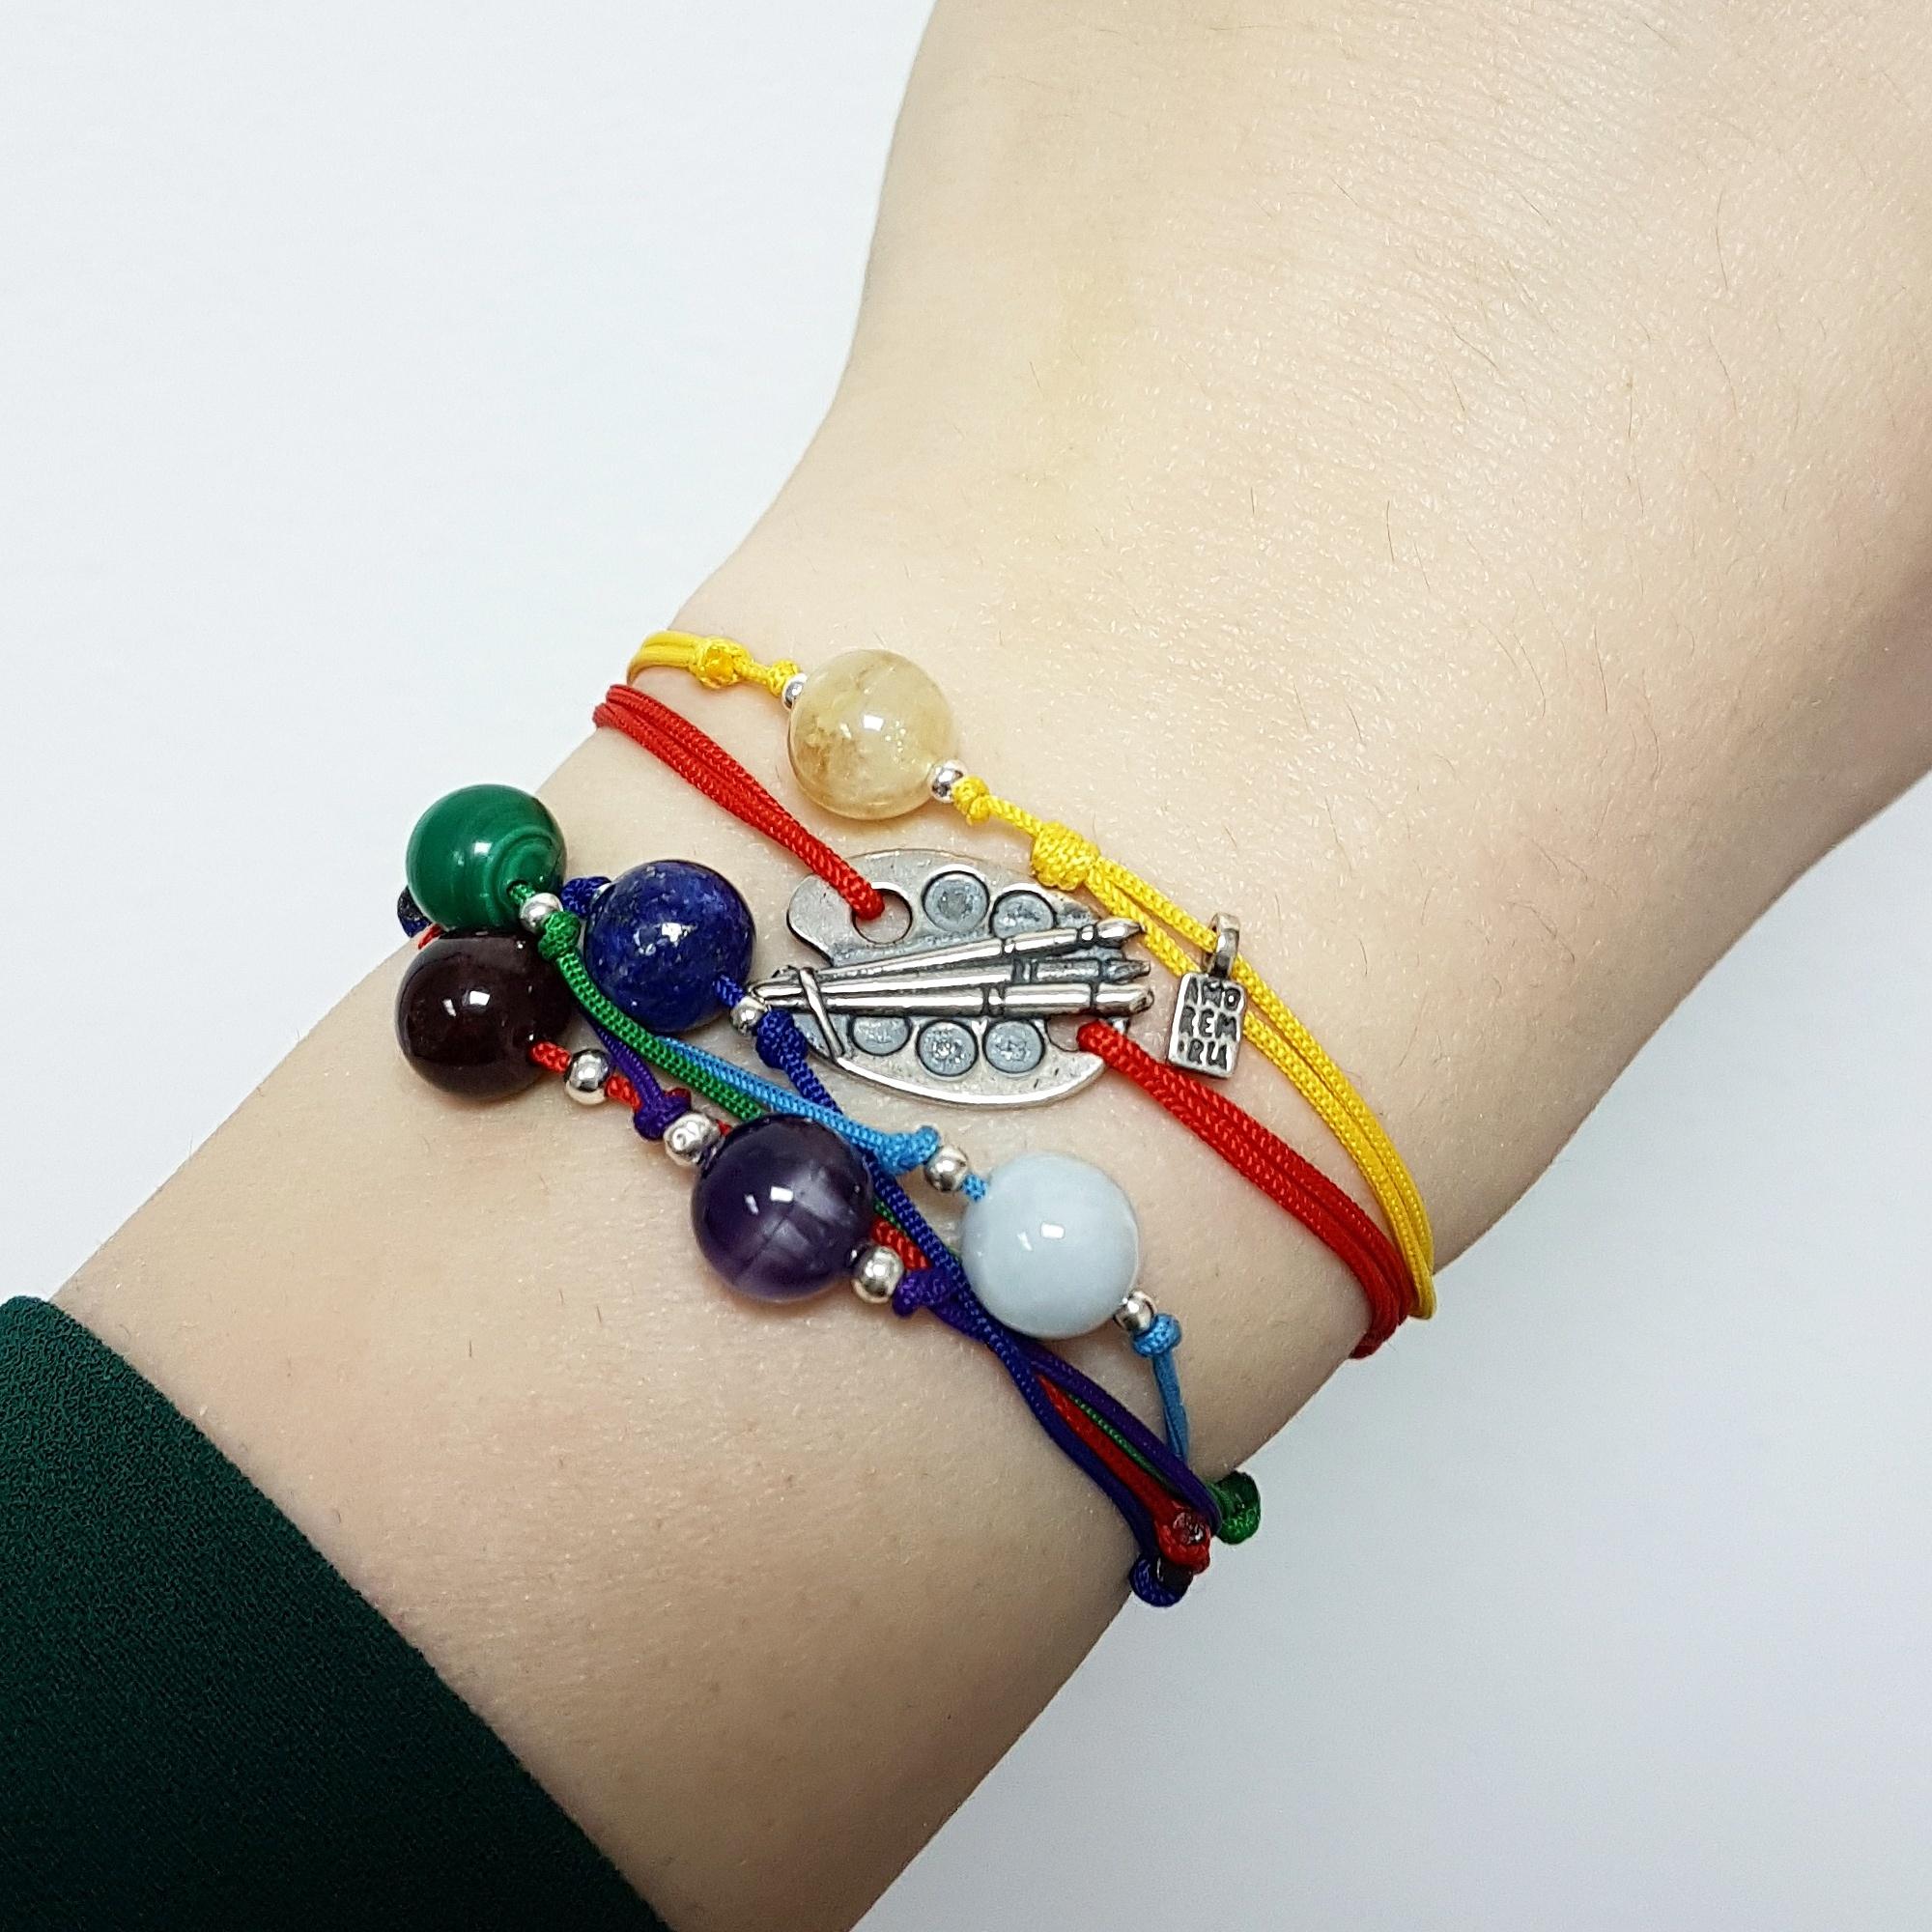 5th Chakra bracelet with Aquamarine